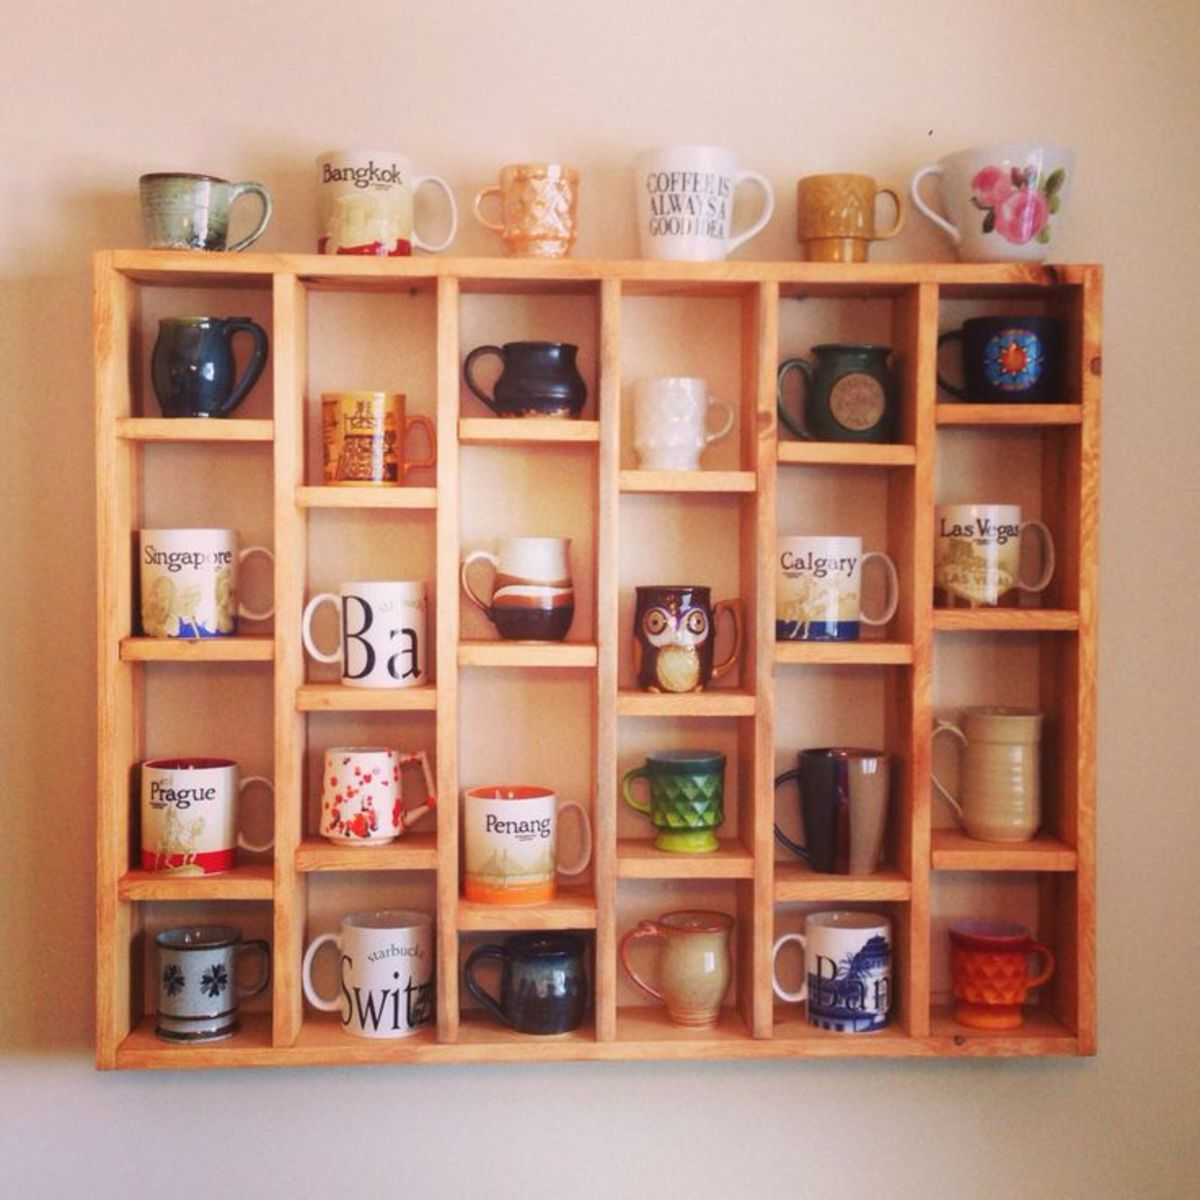 Coffee Mug Displays